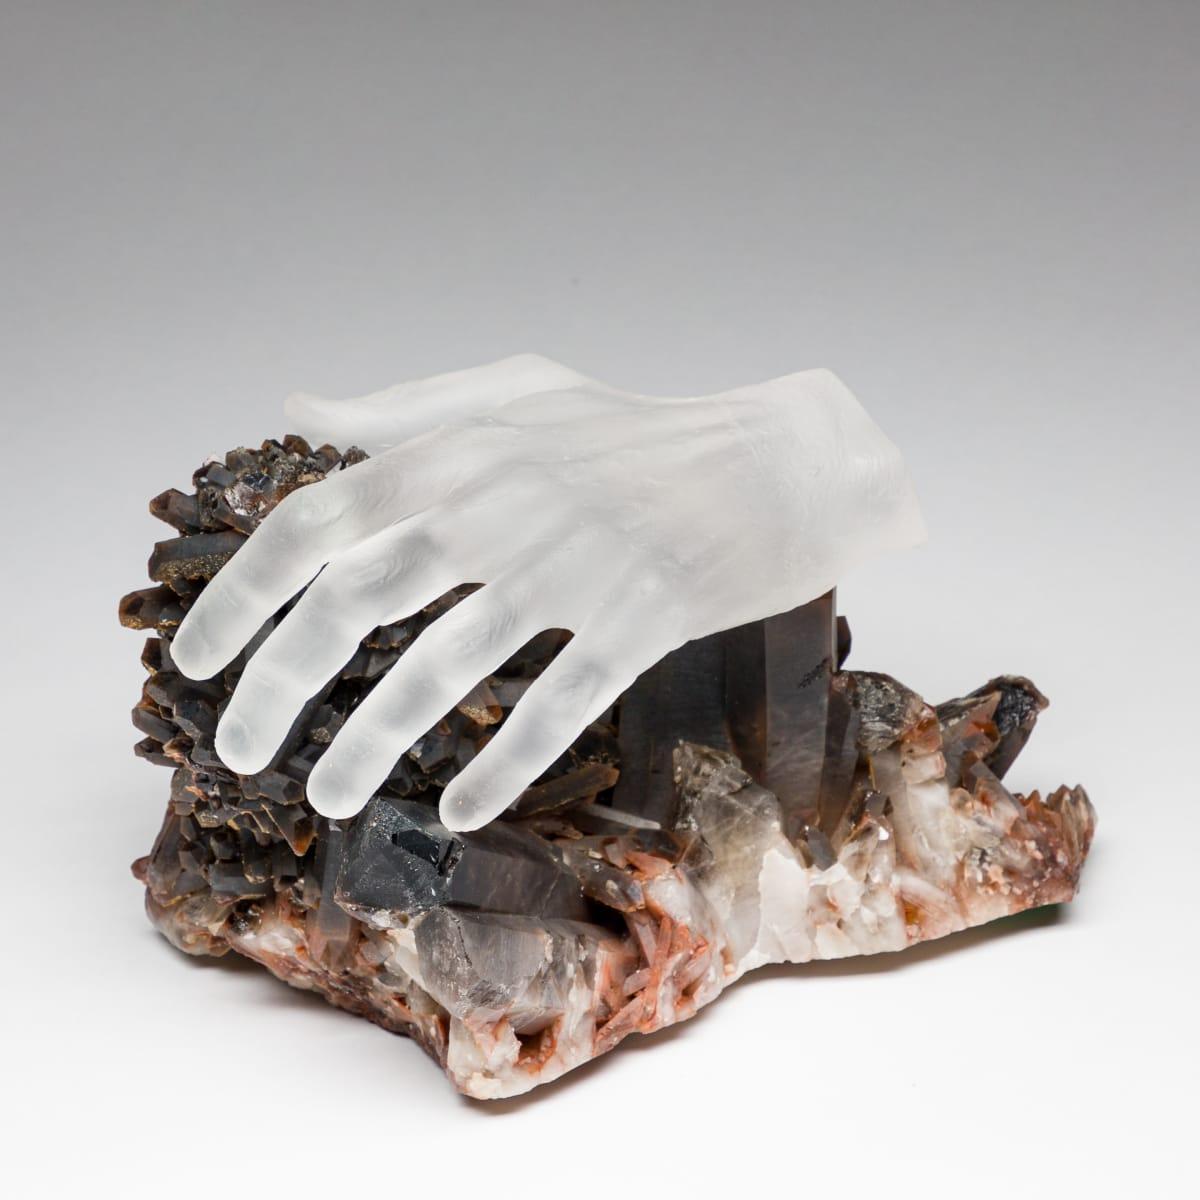 Debra Baxter, Ghost Hand, 2019